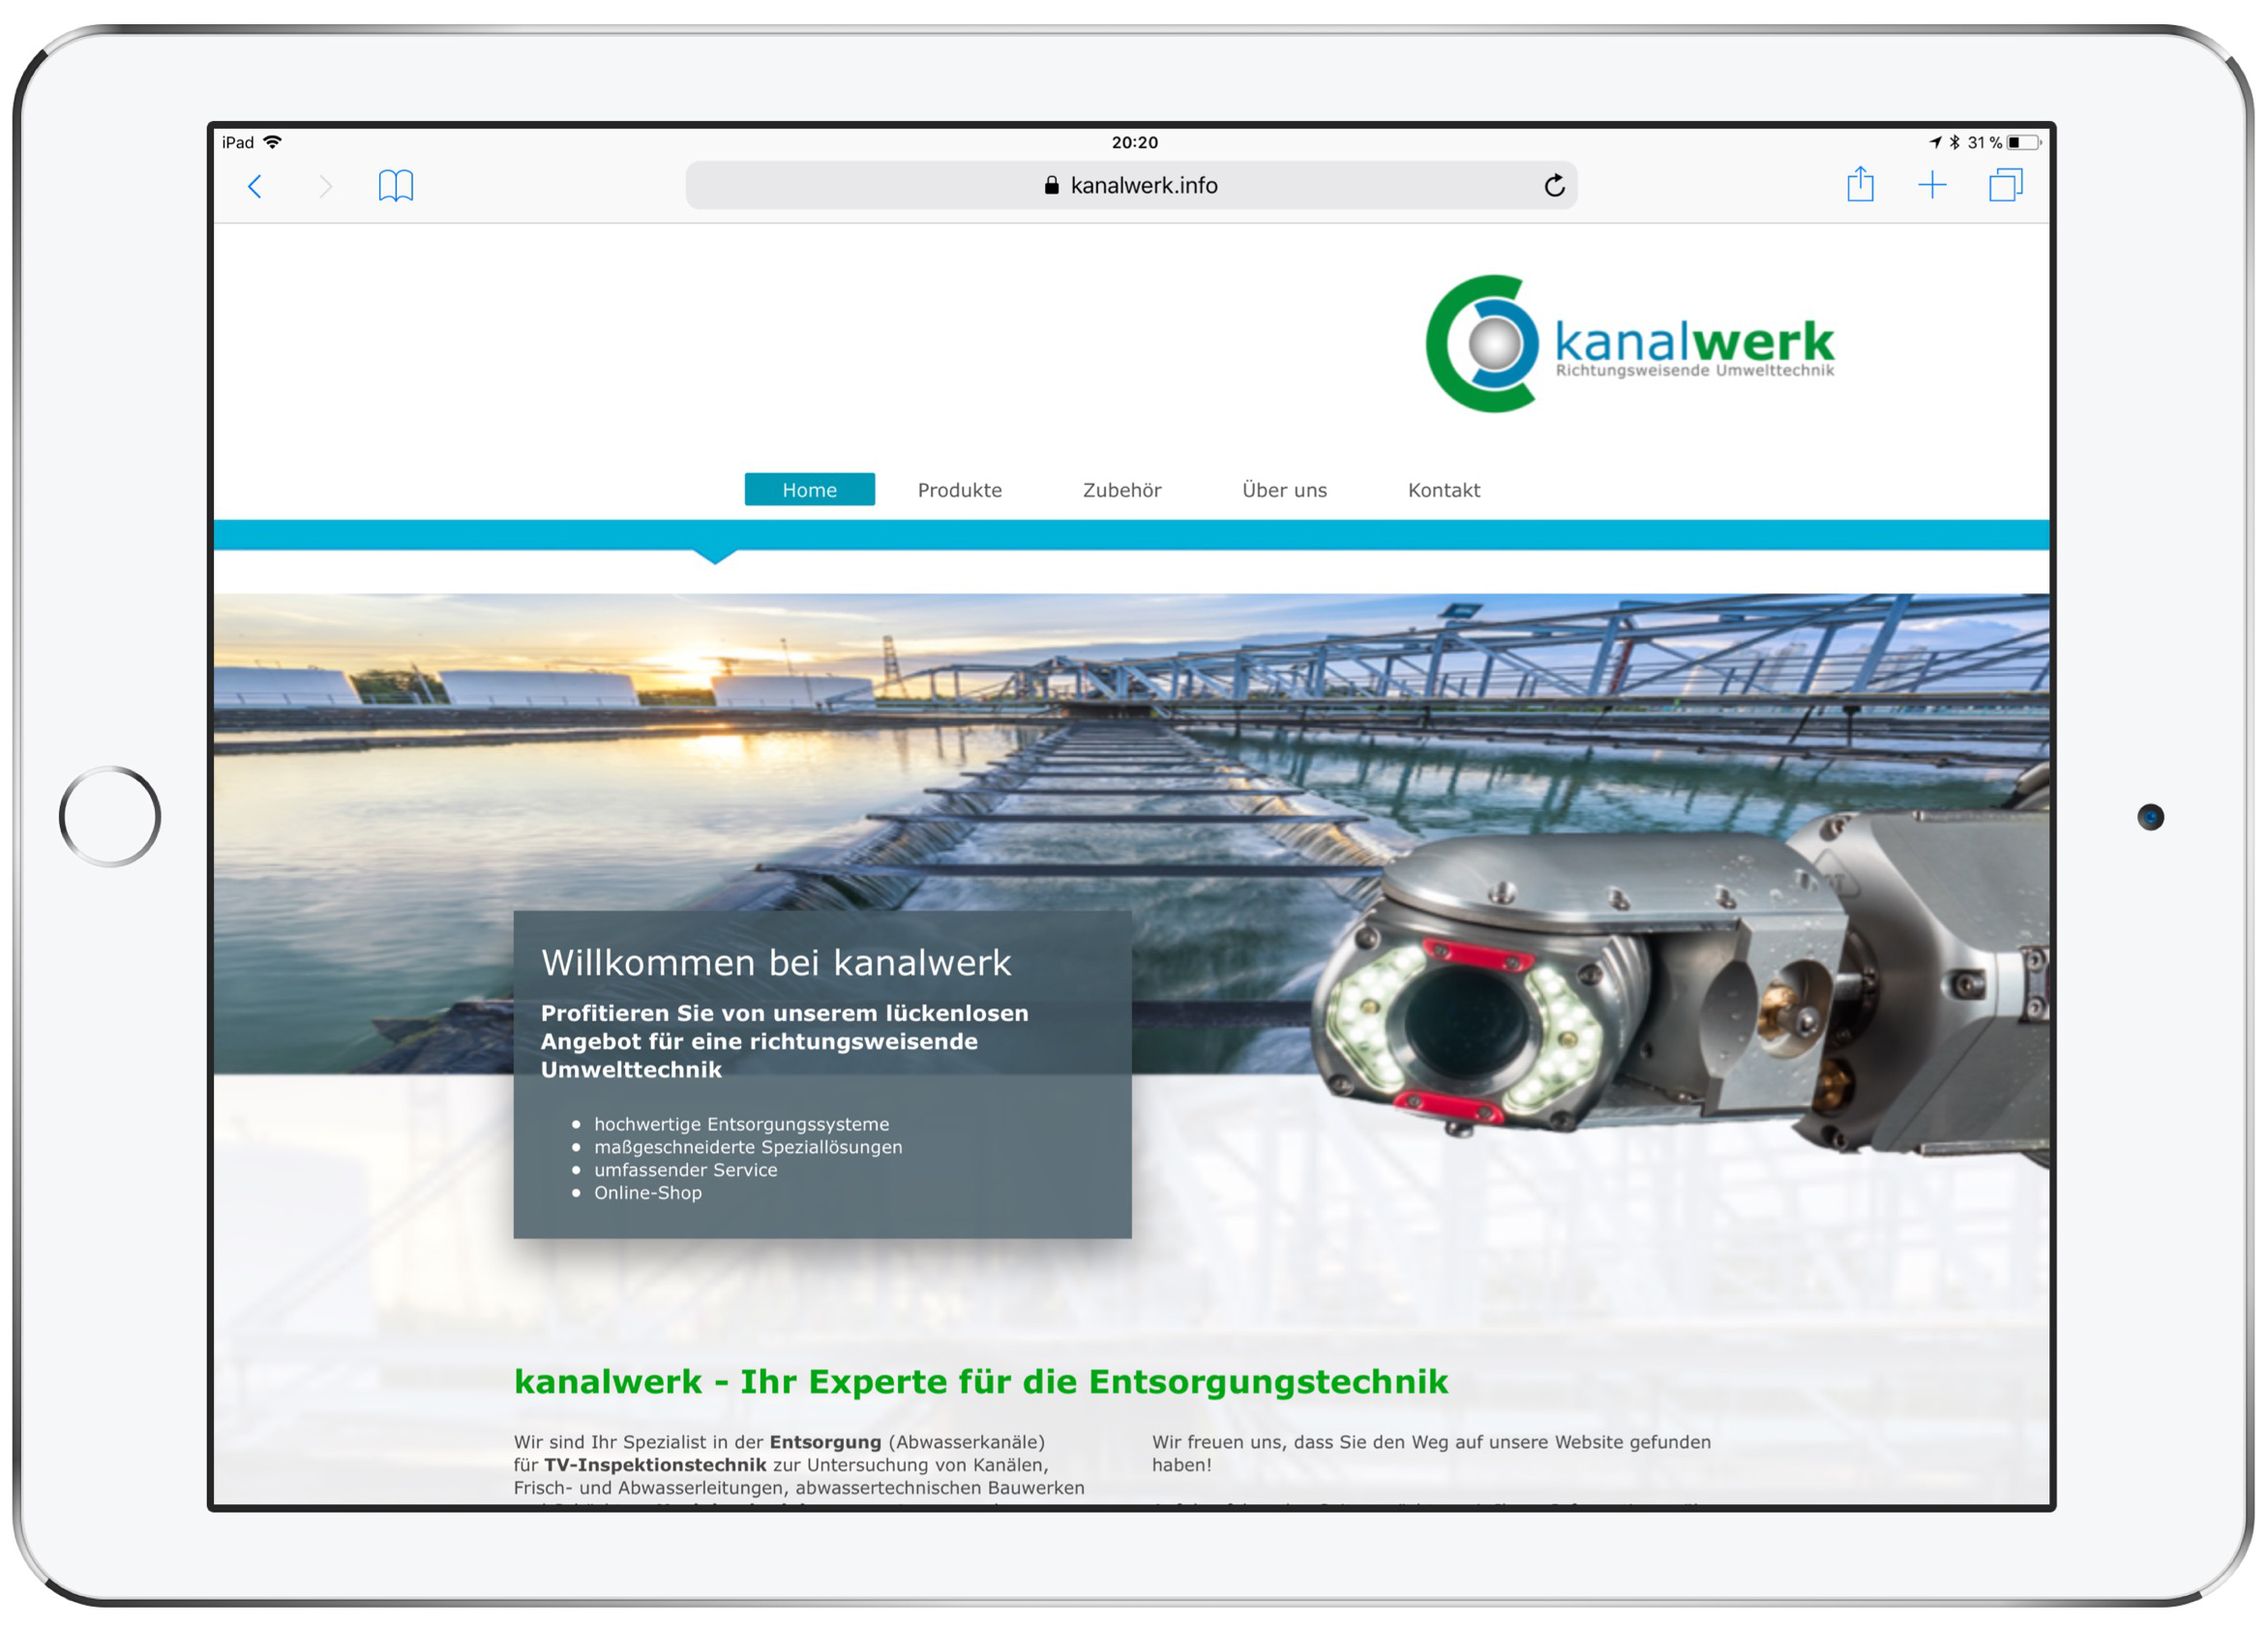 www.kanalwerk.com